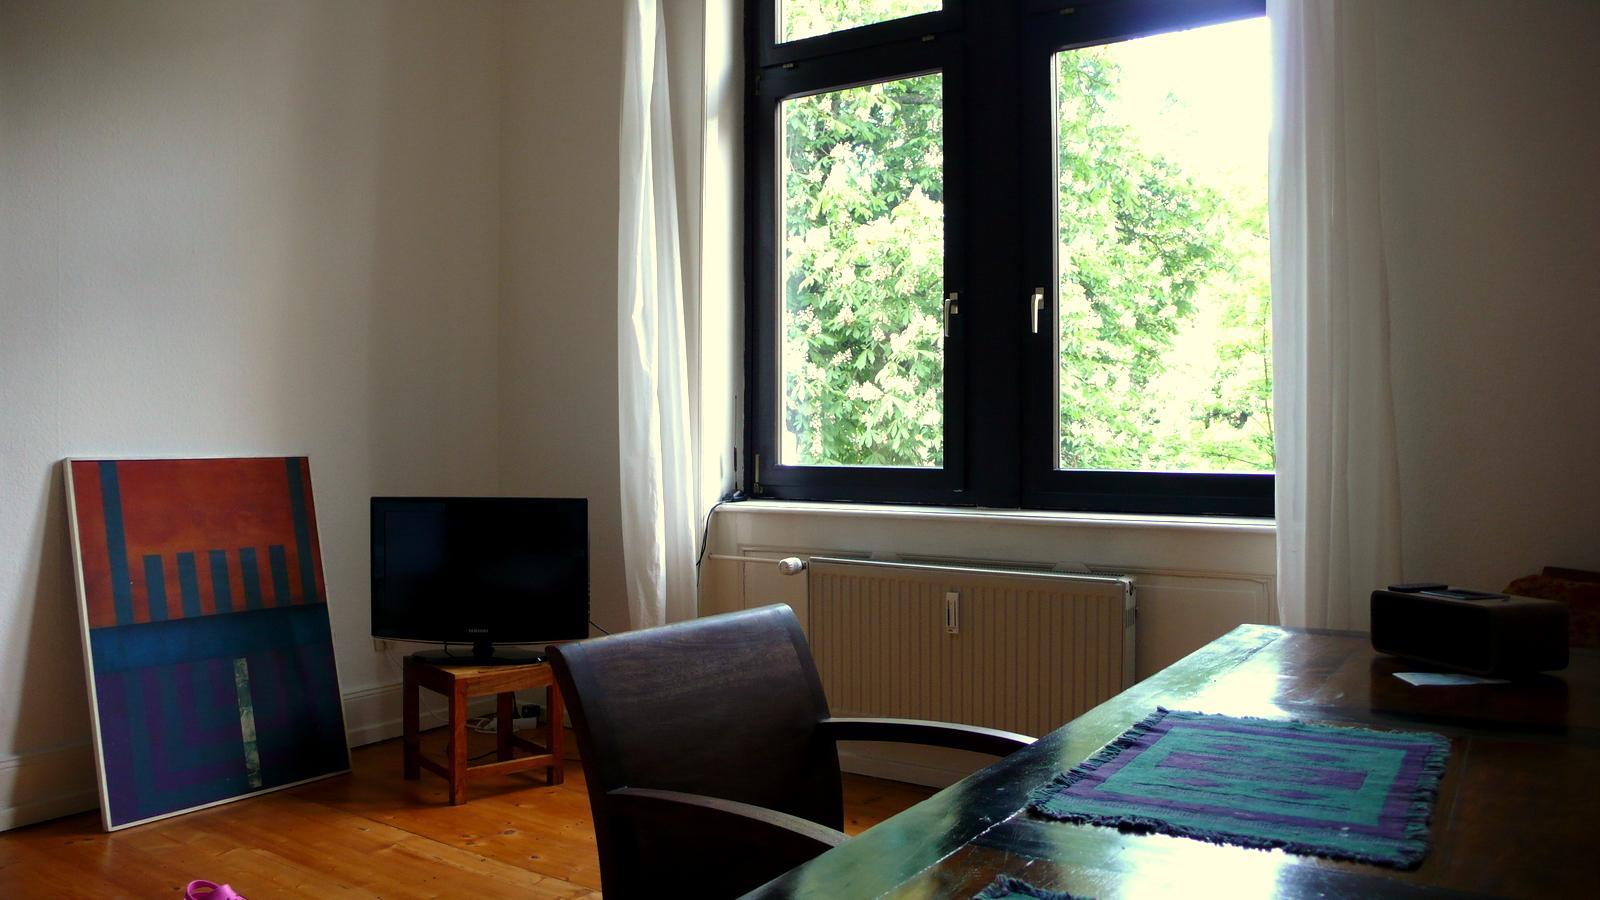 2nd-floor-10 Furnished apartment with Balcony in Frankfurt Bockenheim %Bockenheim